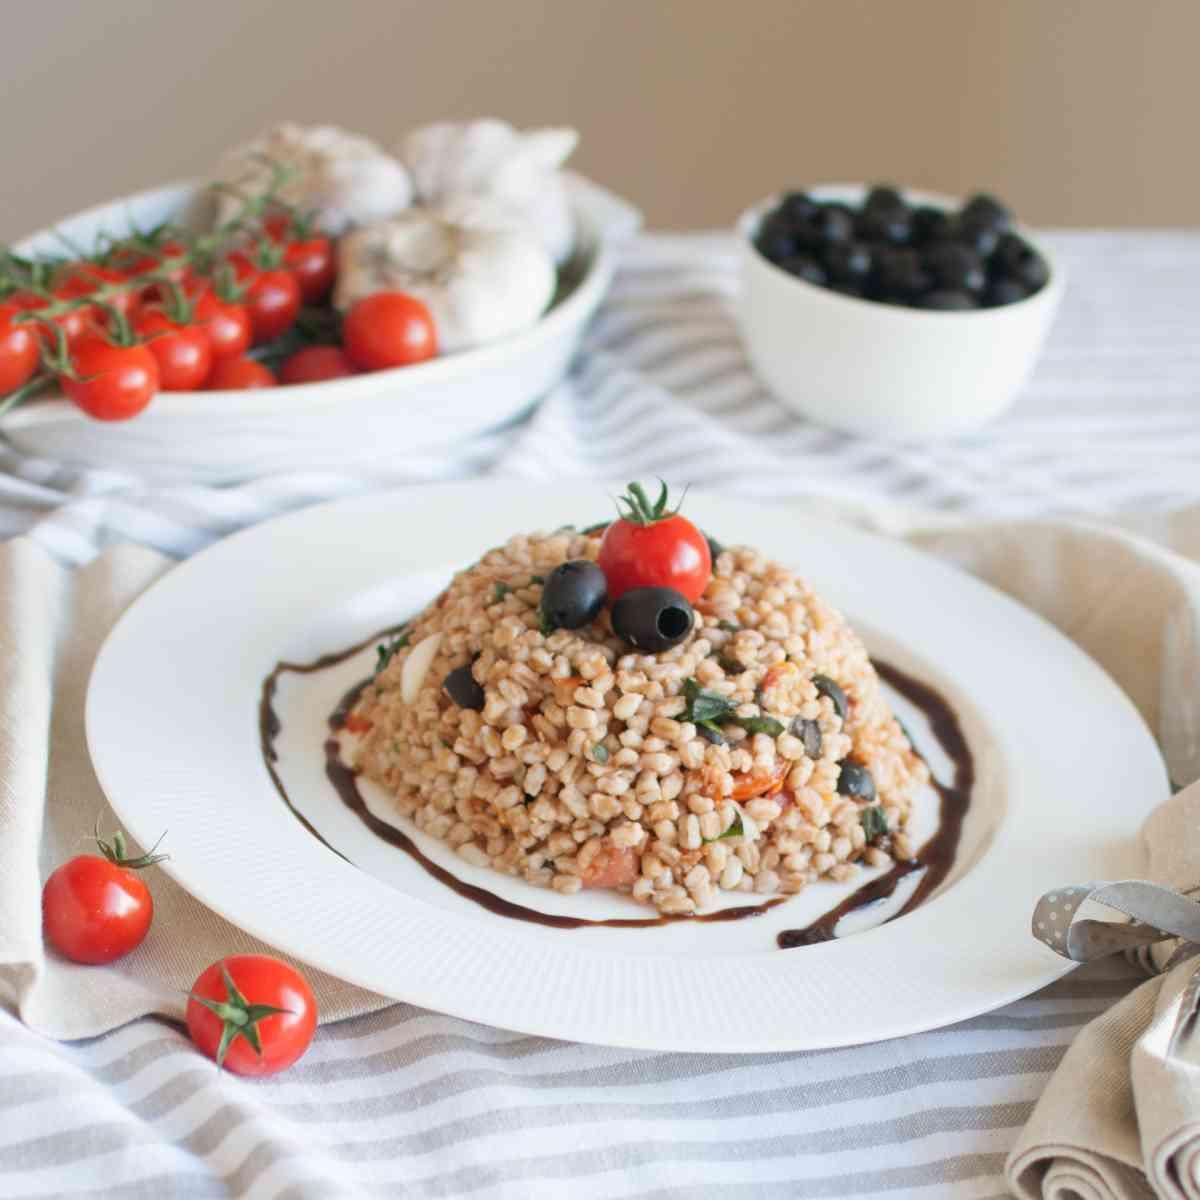 Balsamicové špaldoto s tomaty, olivami a bazalkou, mozzarella